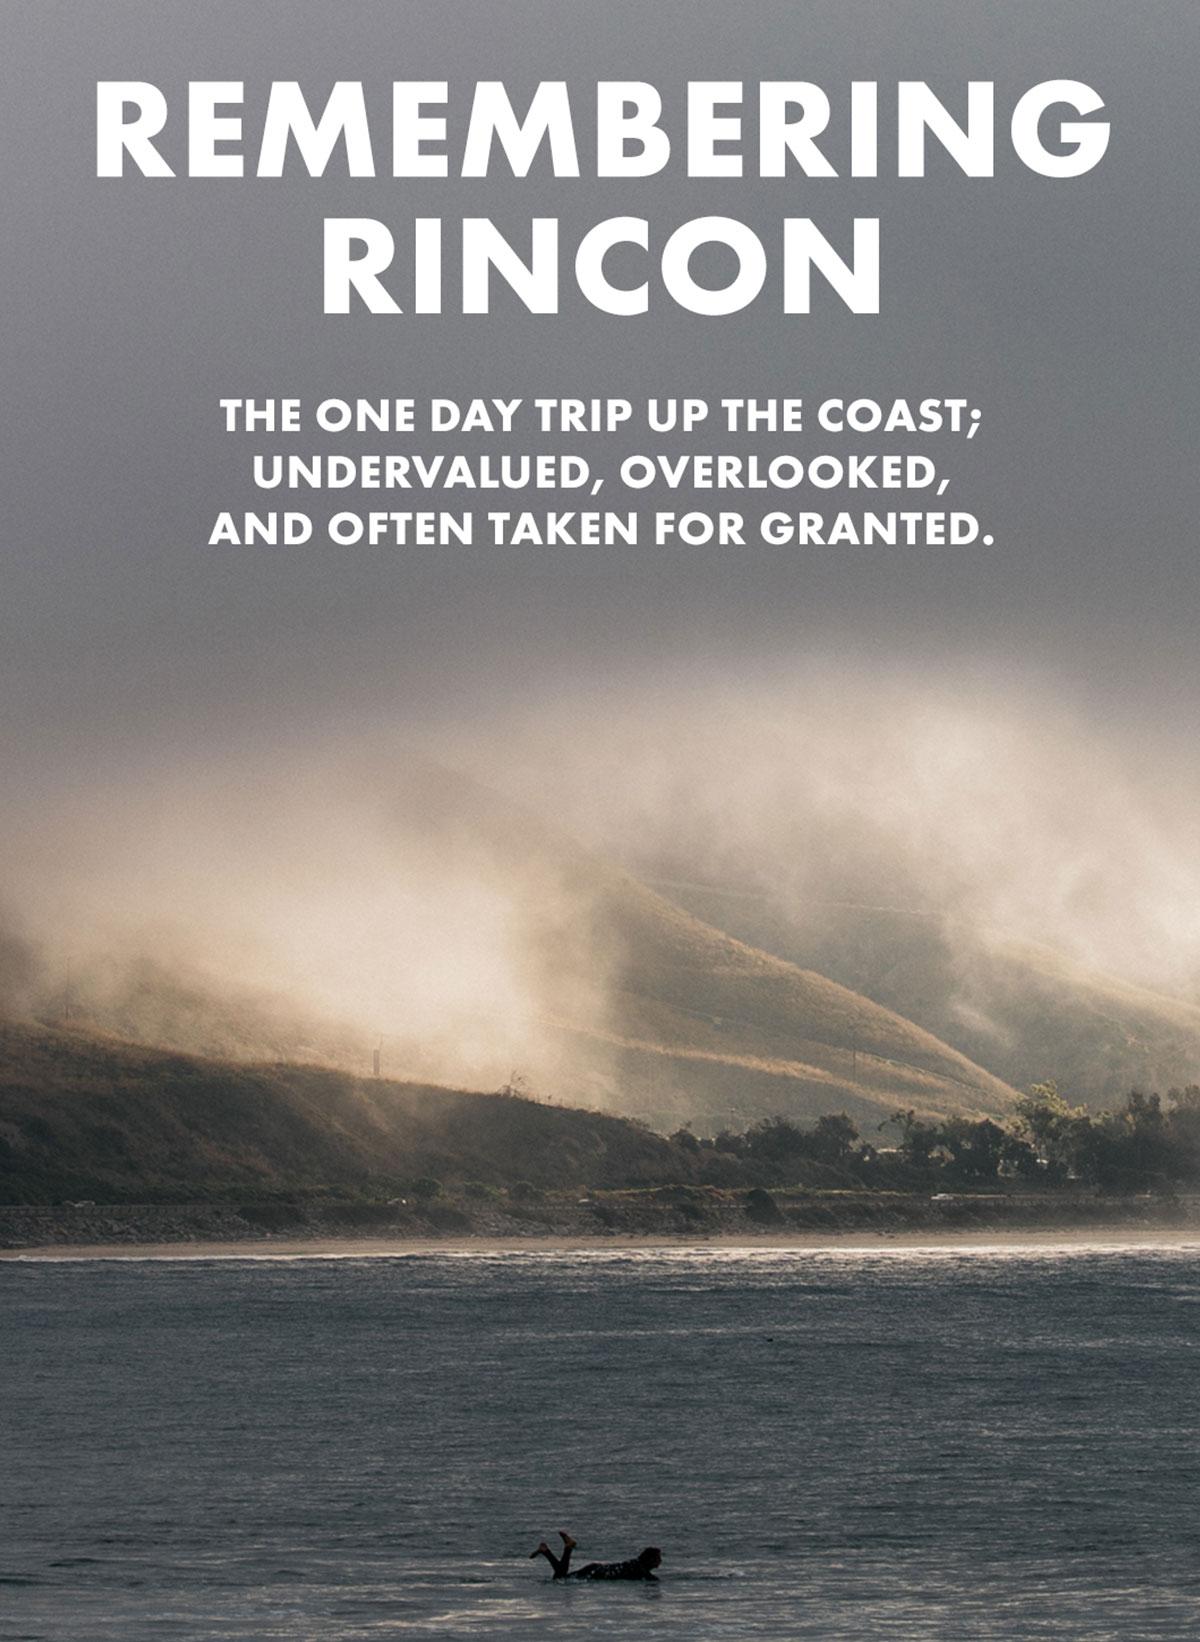 REMEMBERING RINCON